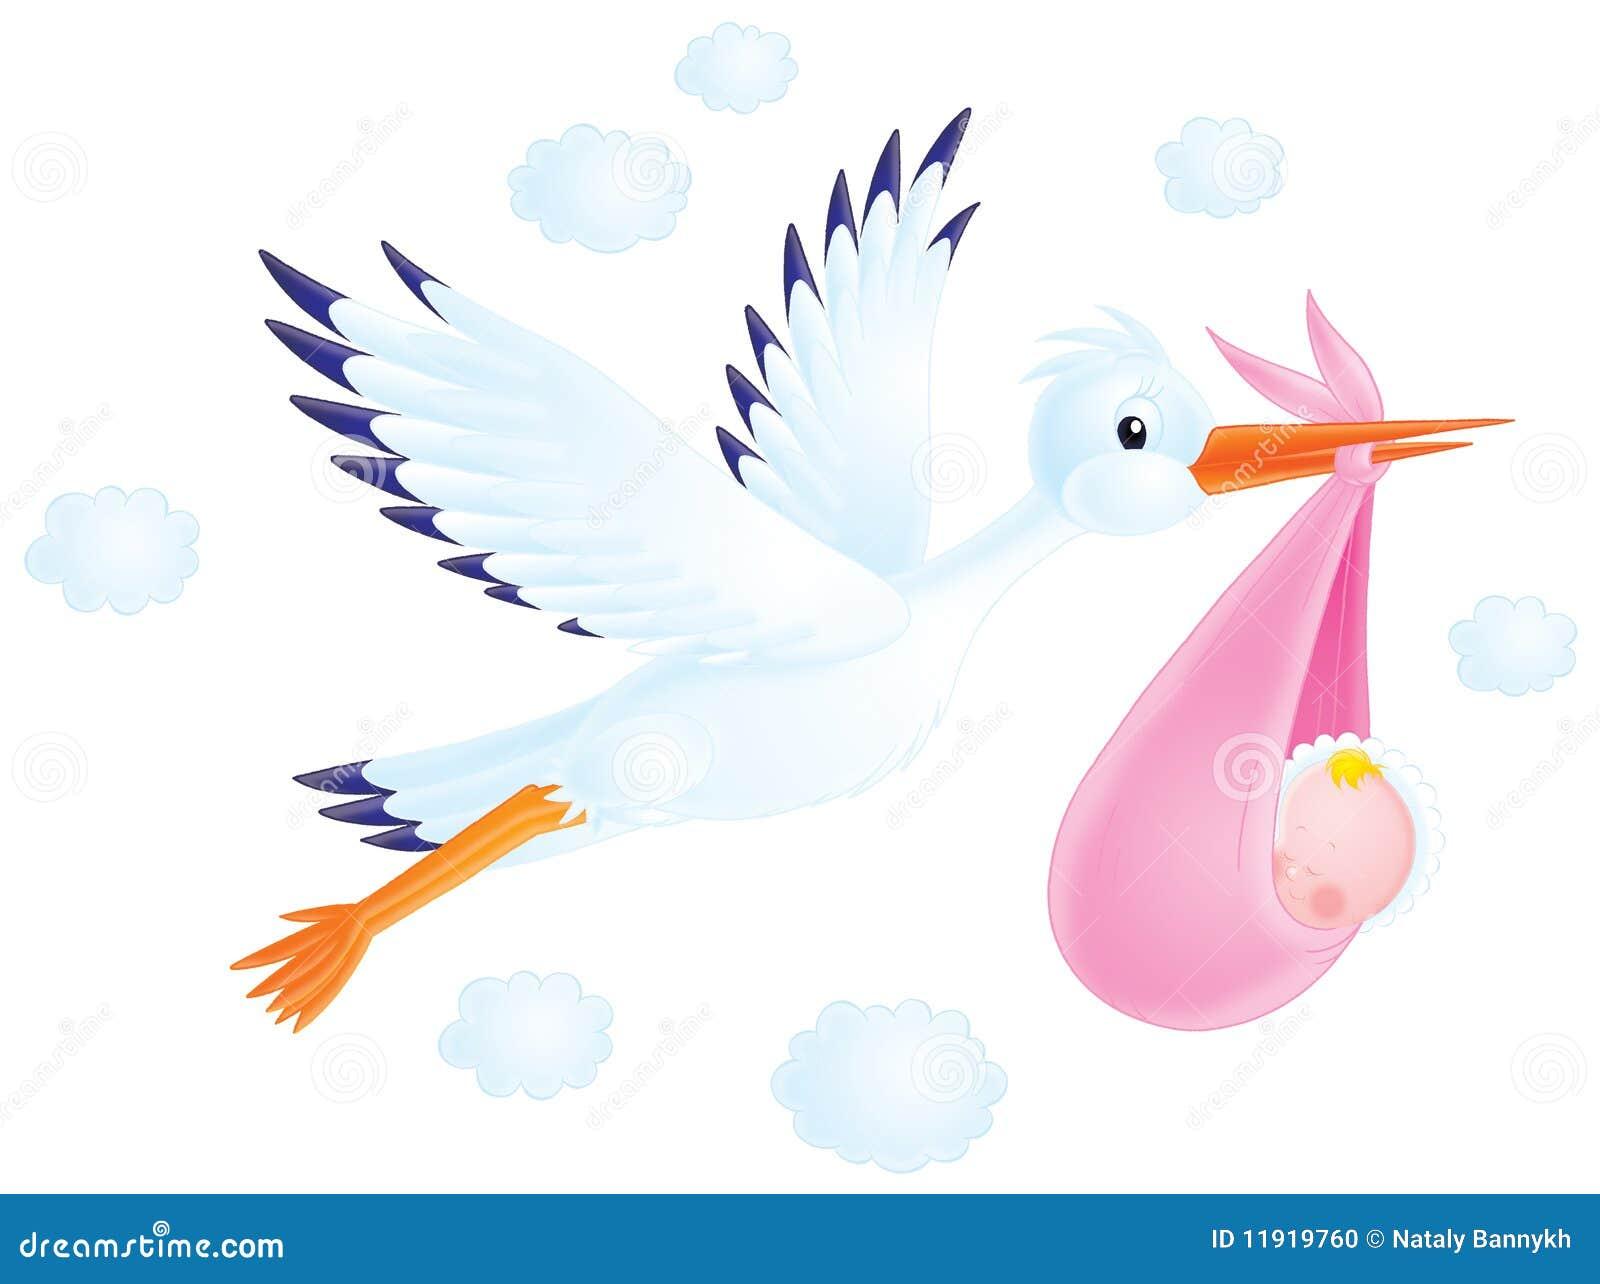 kleurplaat baby met ooievaar